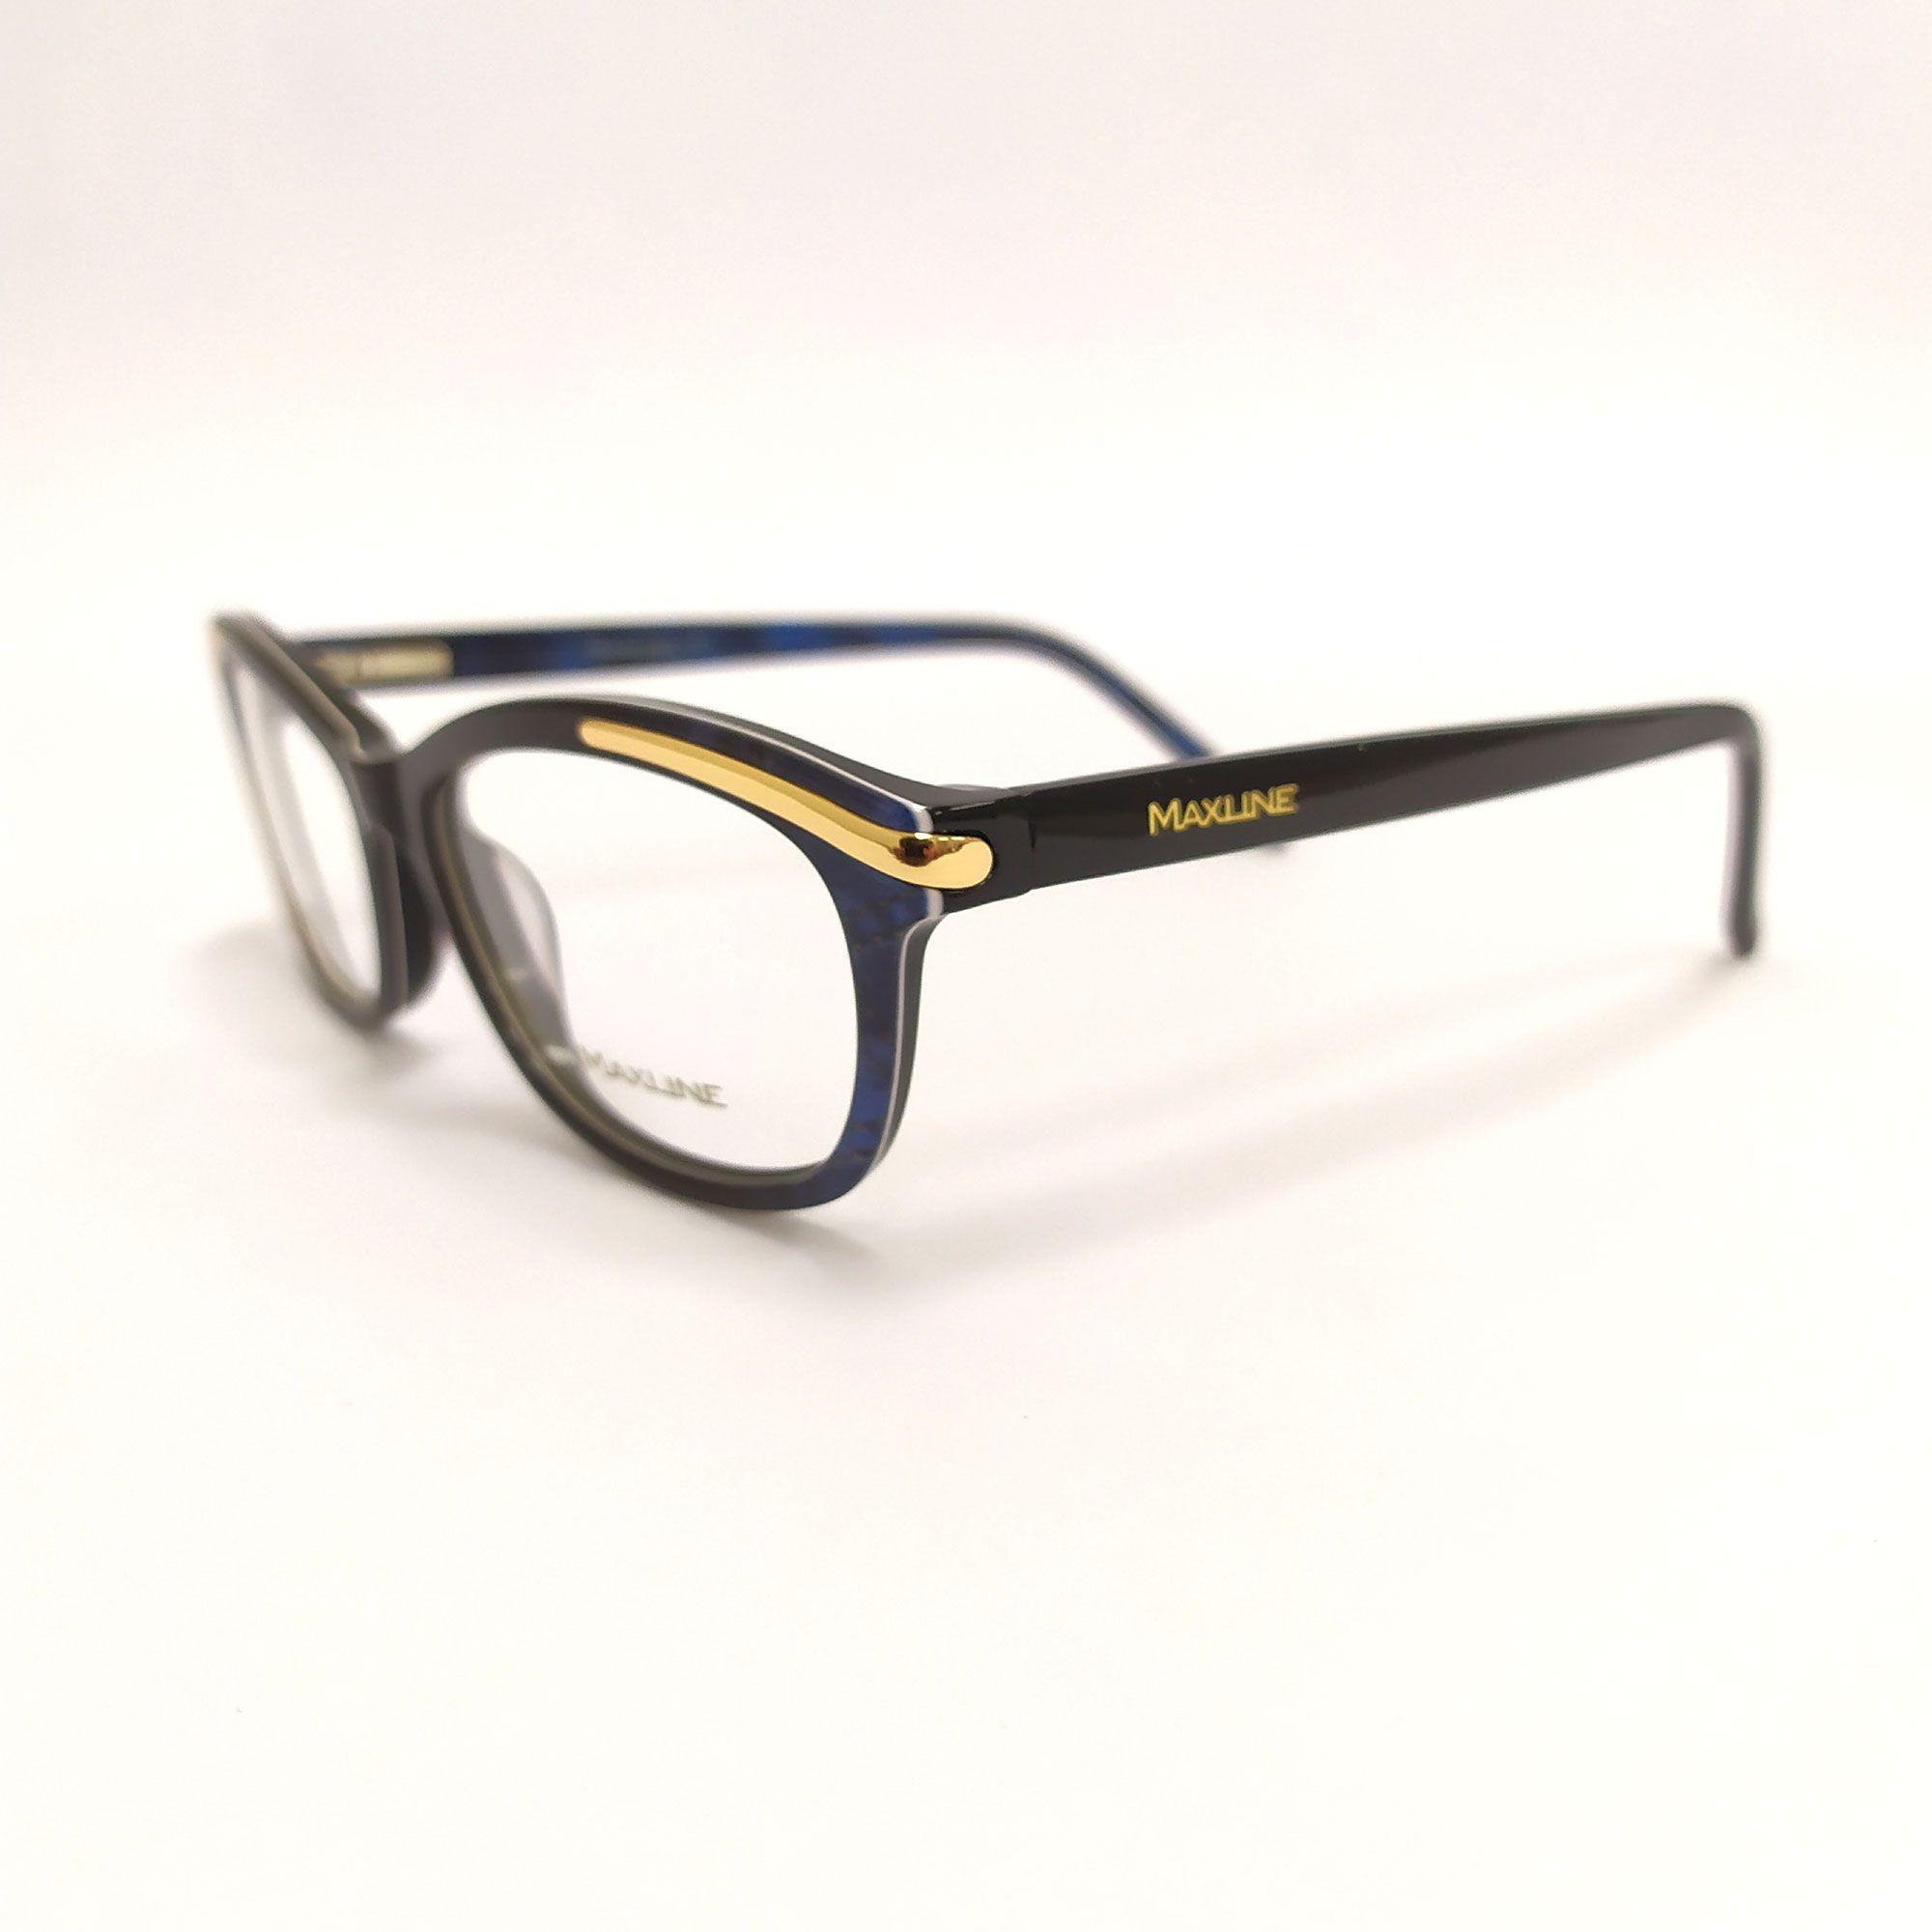 Óculos de Grau Maxline Preto ML1001